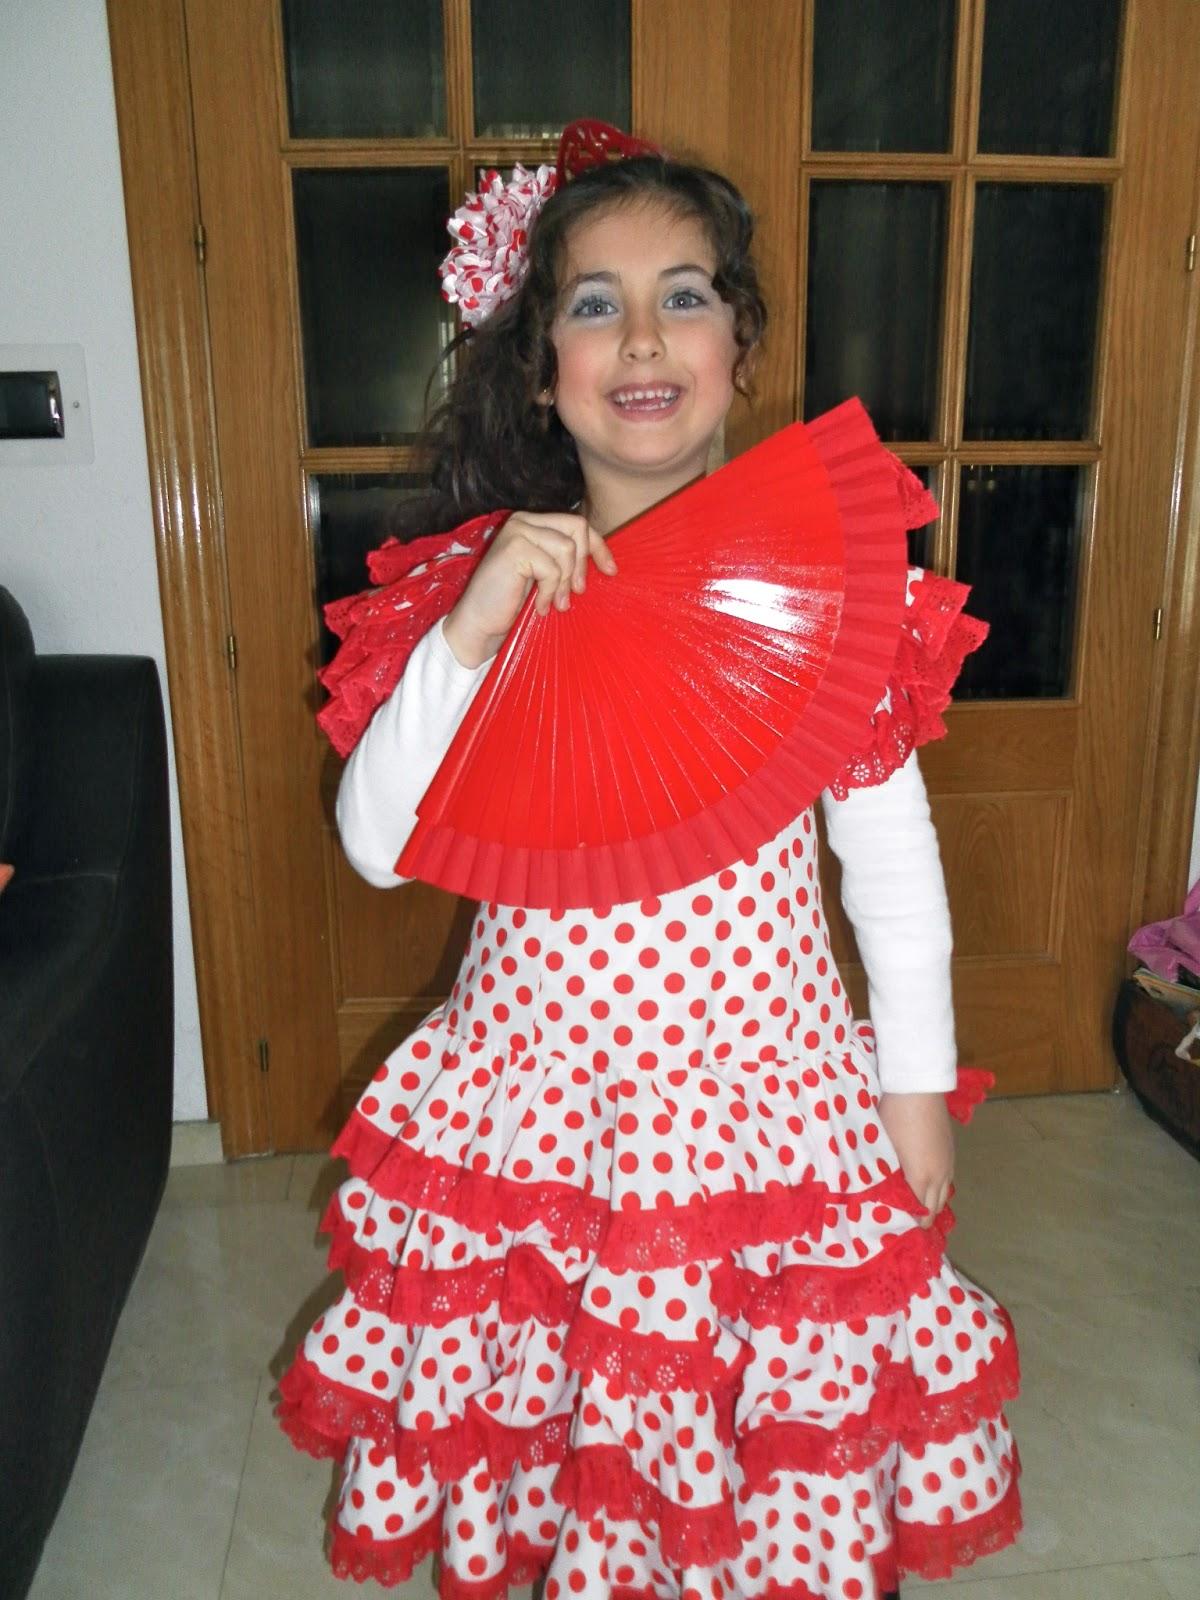 b5d475d9e Solo yo: Disfraz de Flamenca..